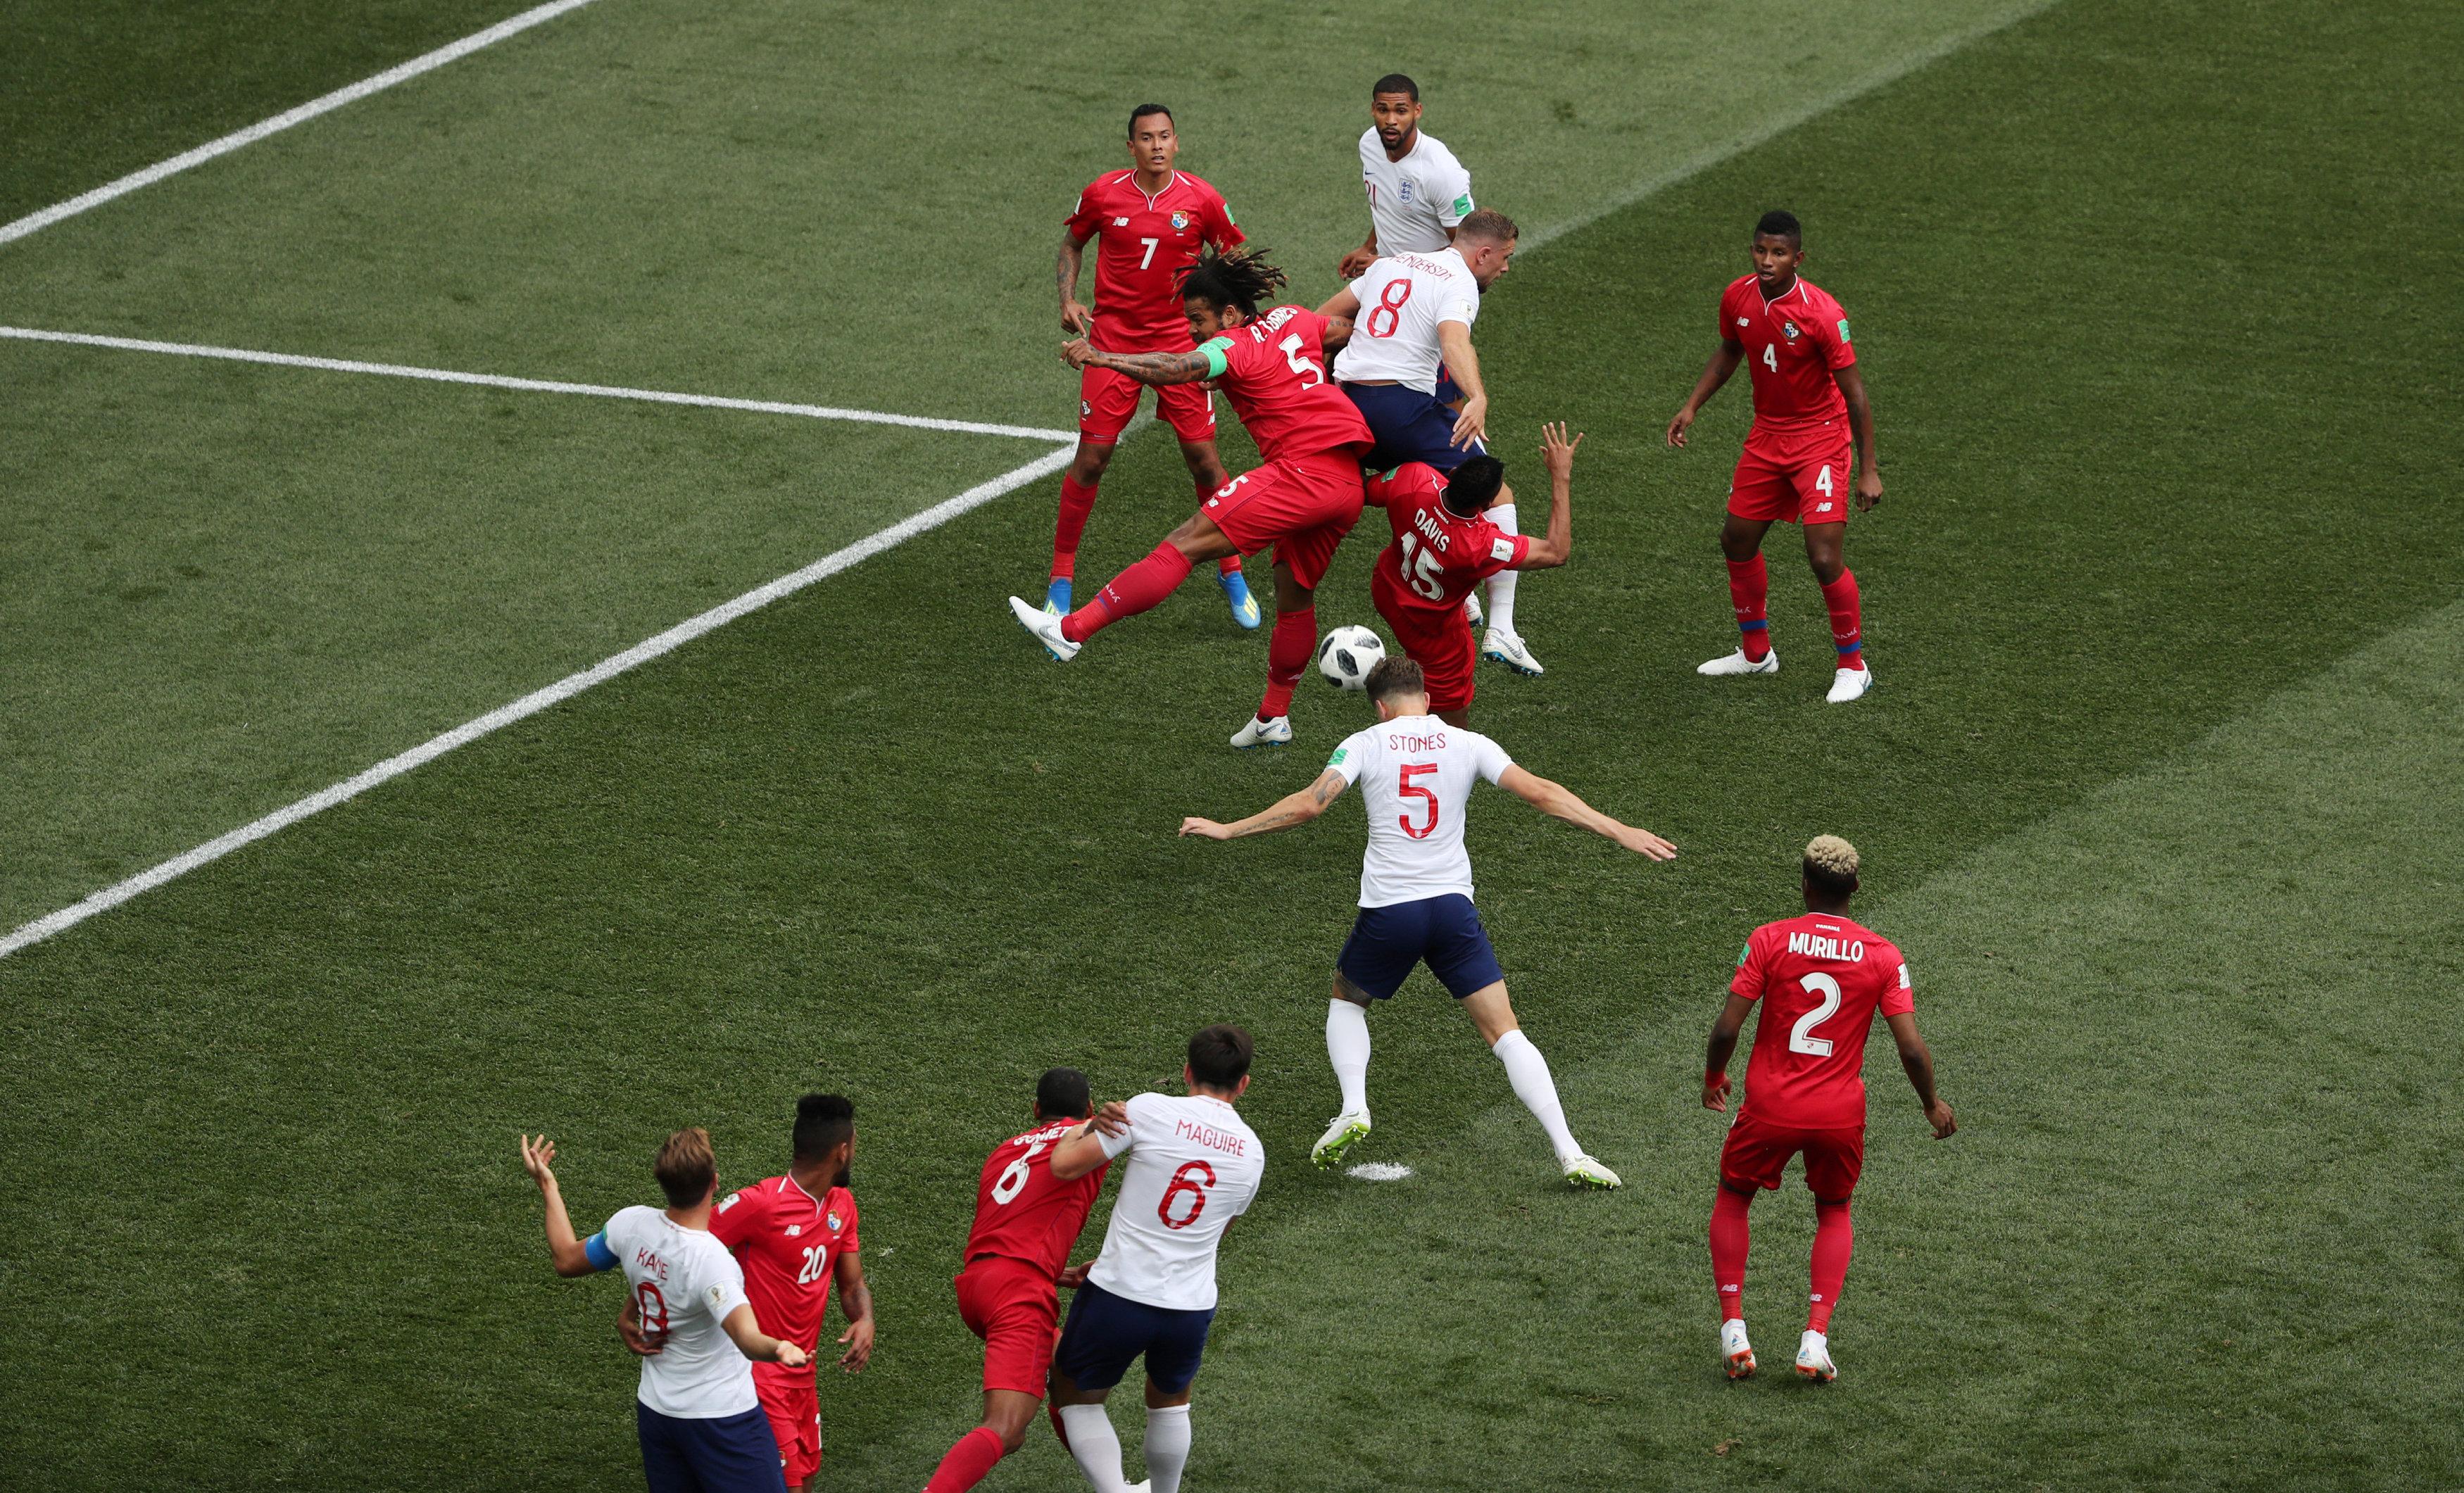 Soccer Football - World Cup - Group G - England vs Panama - Nizhny Novgorod Stadium, Nizhny Novgorod, Russia - June 24, 2018 England's John Stones scores their first goal